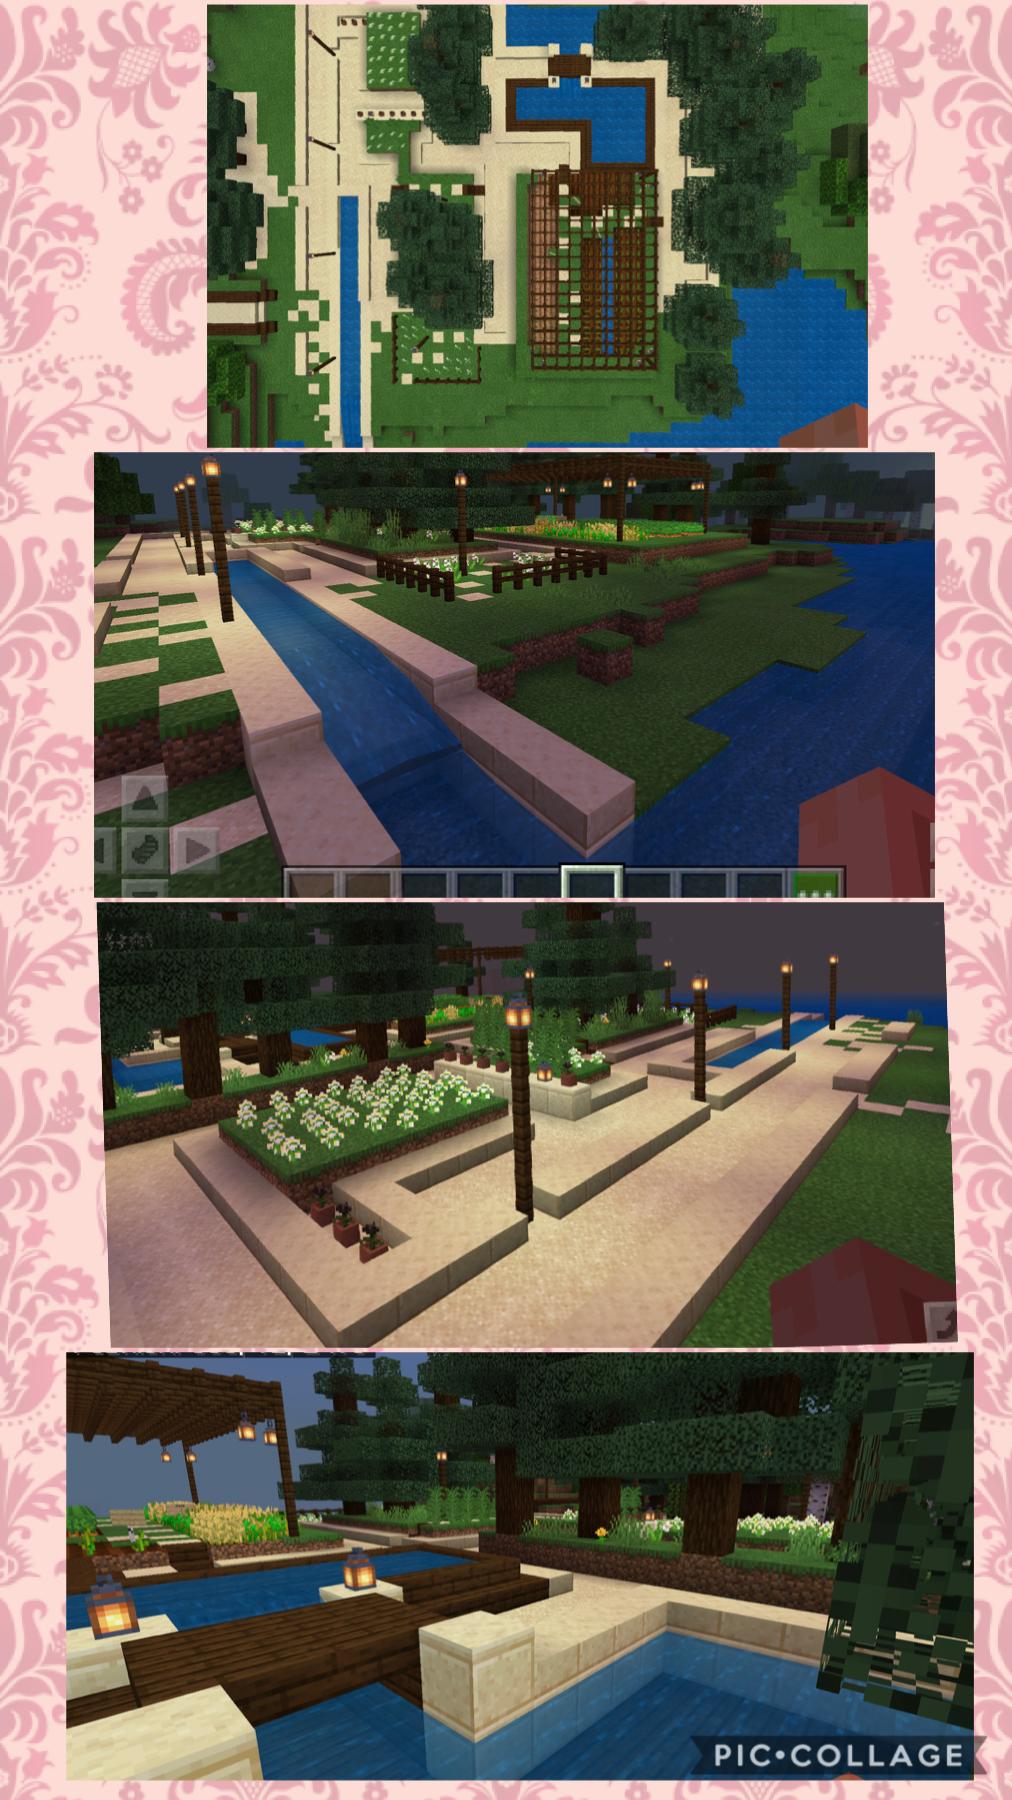 built a garden/ maze in minecraft coz i have no life 😇